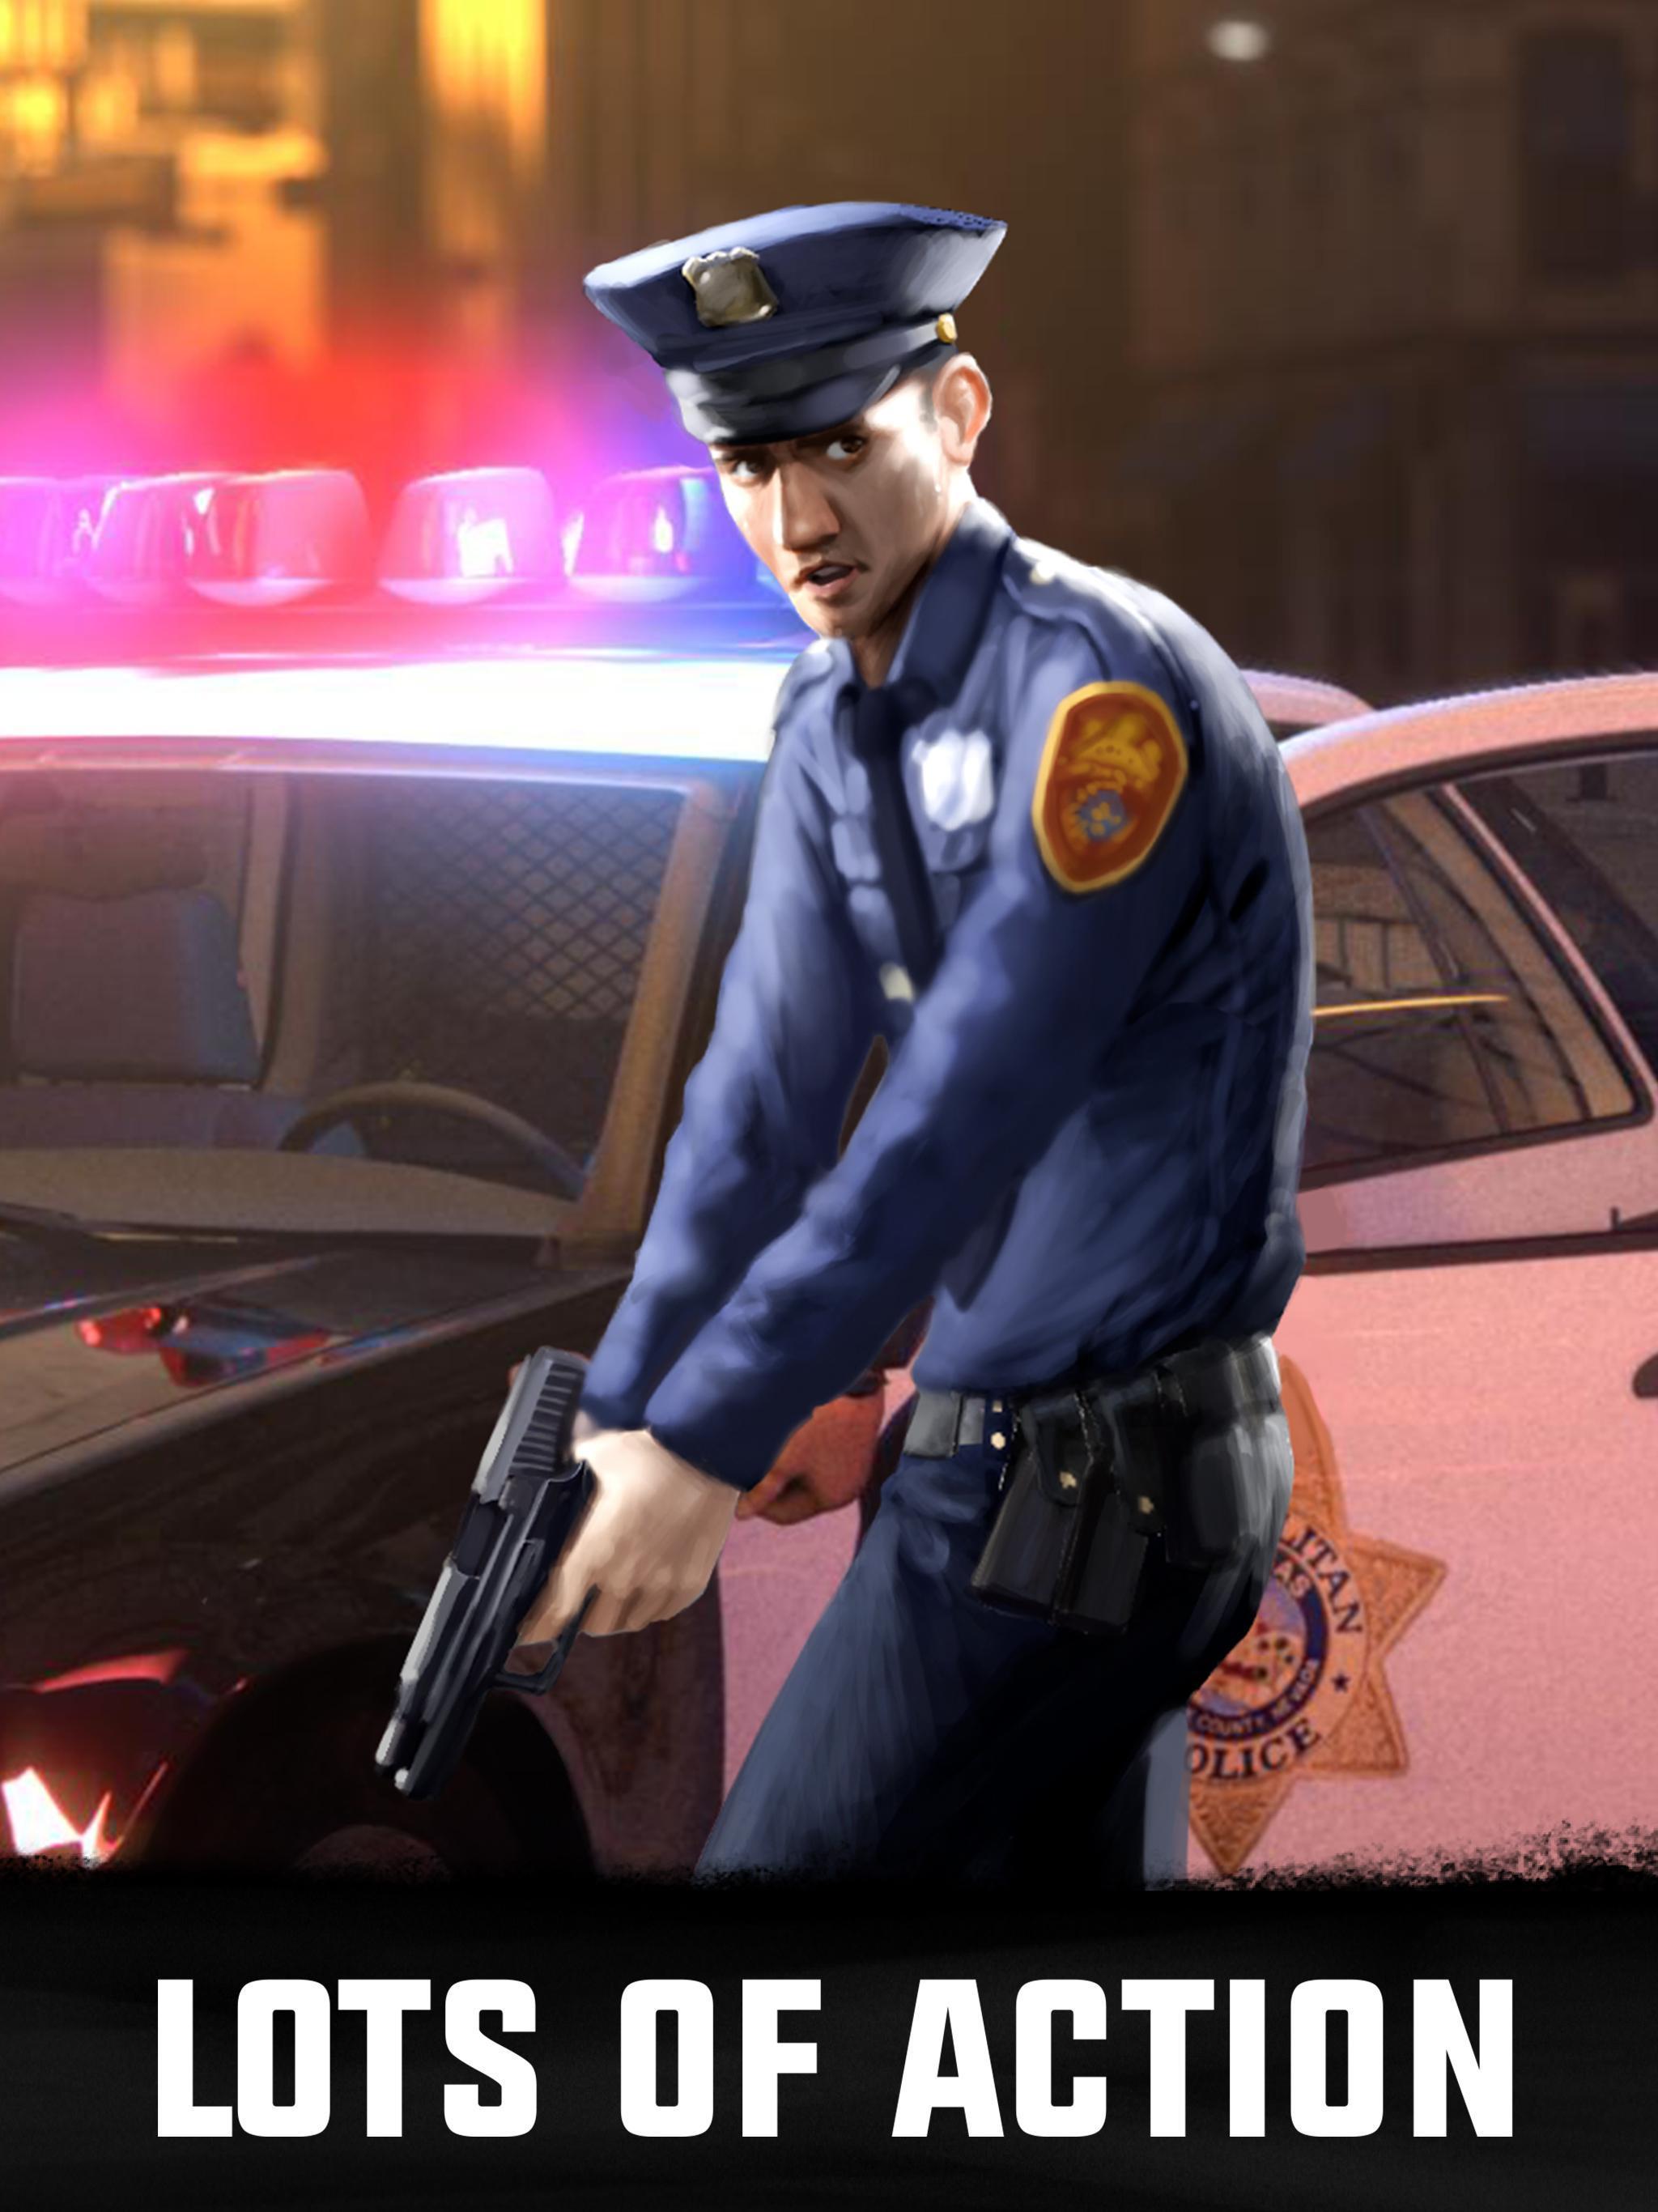 Sniper 3D Fun Free Online FPS Shooting Game 3.15.1 Screenshot 18